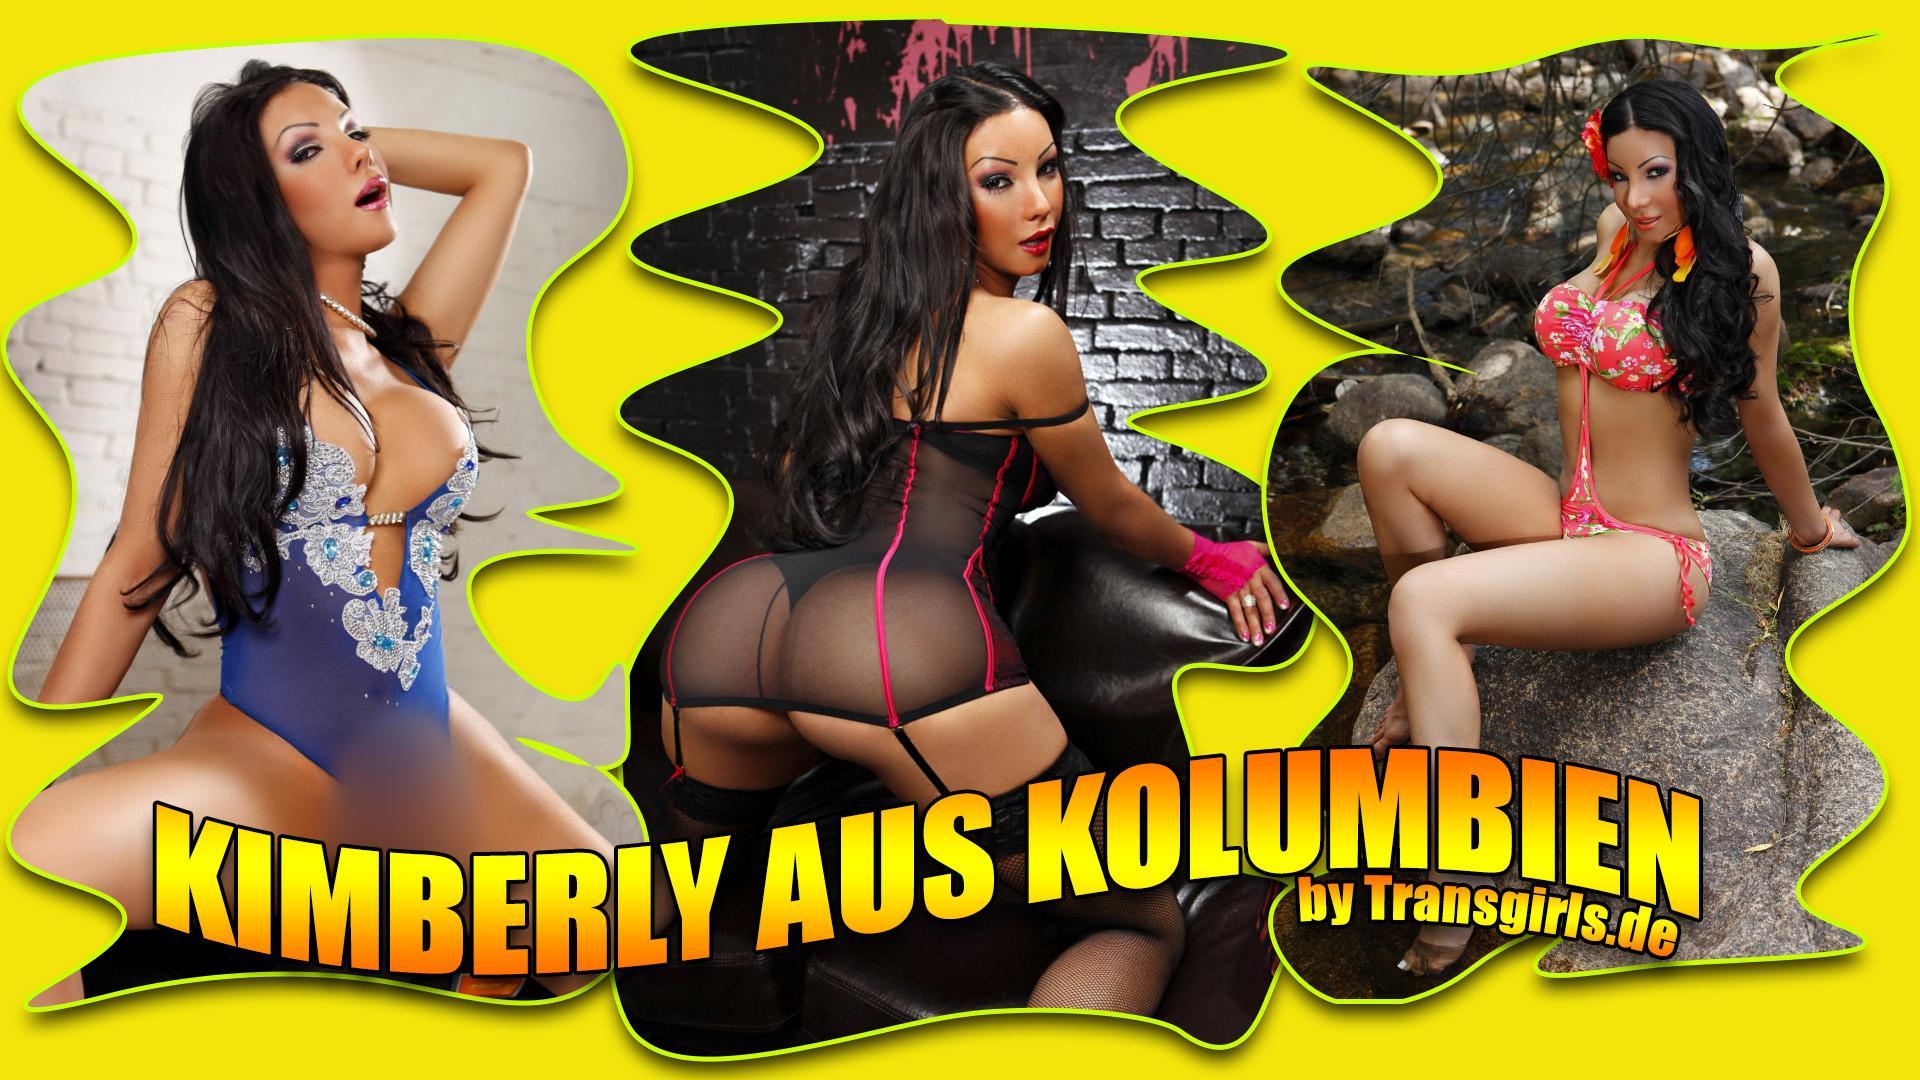 <?php echo Kimberly aus Kolumbien ?> Shemale in <?php echo Berlin ?>